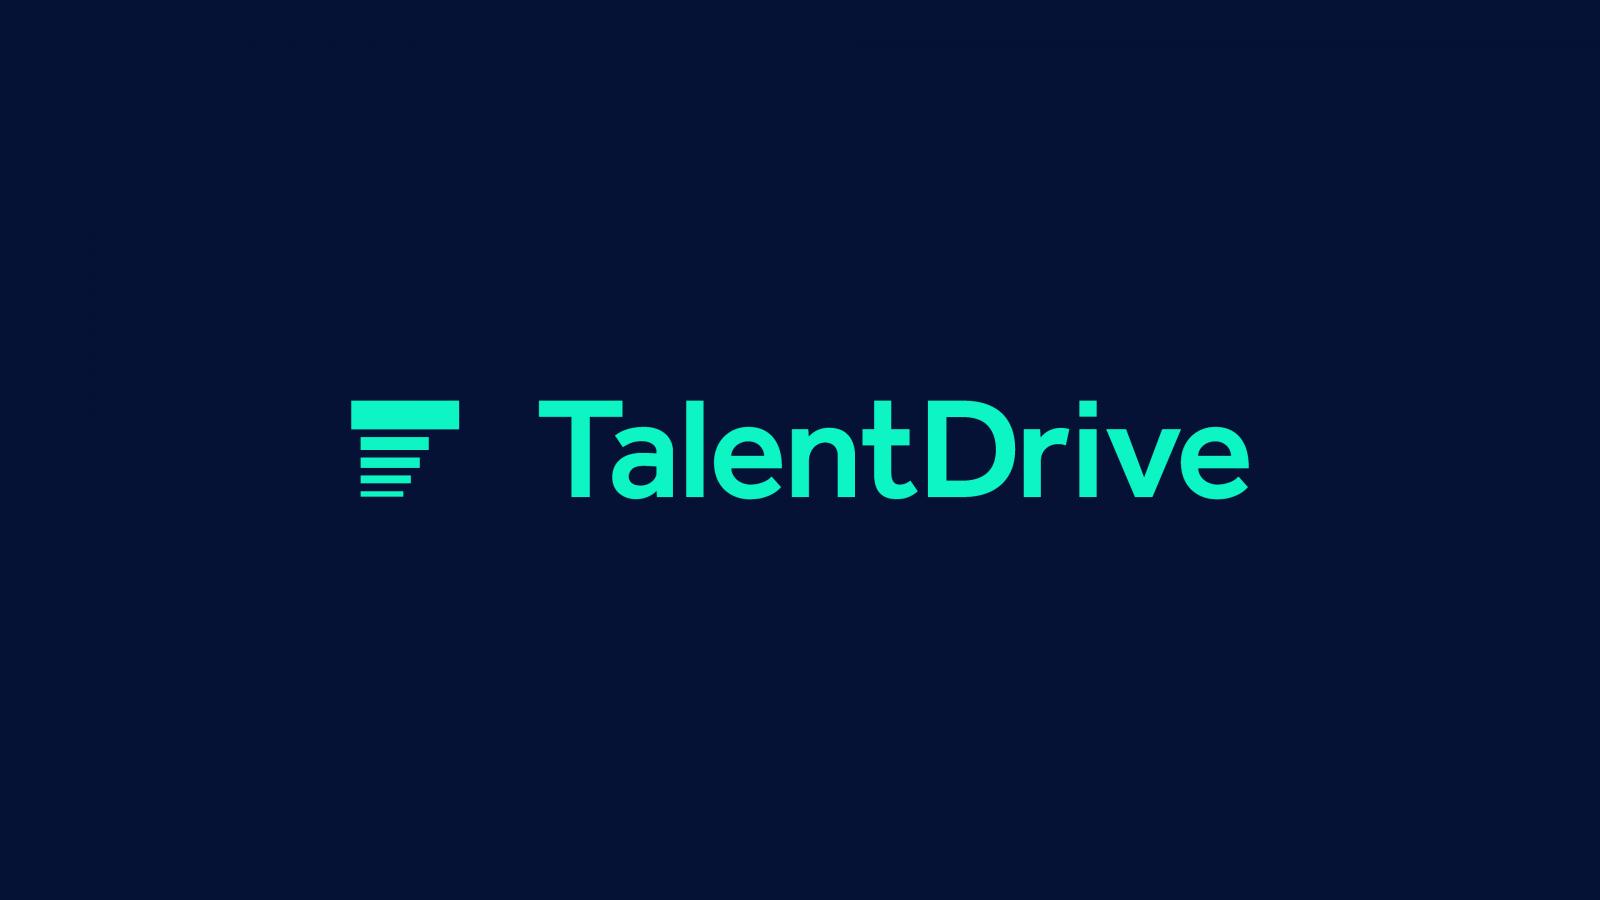 Talent Drive branding